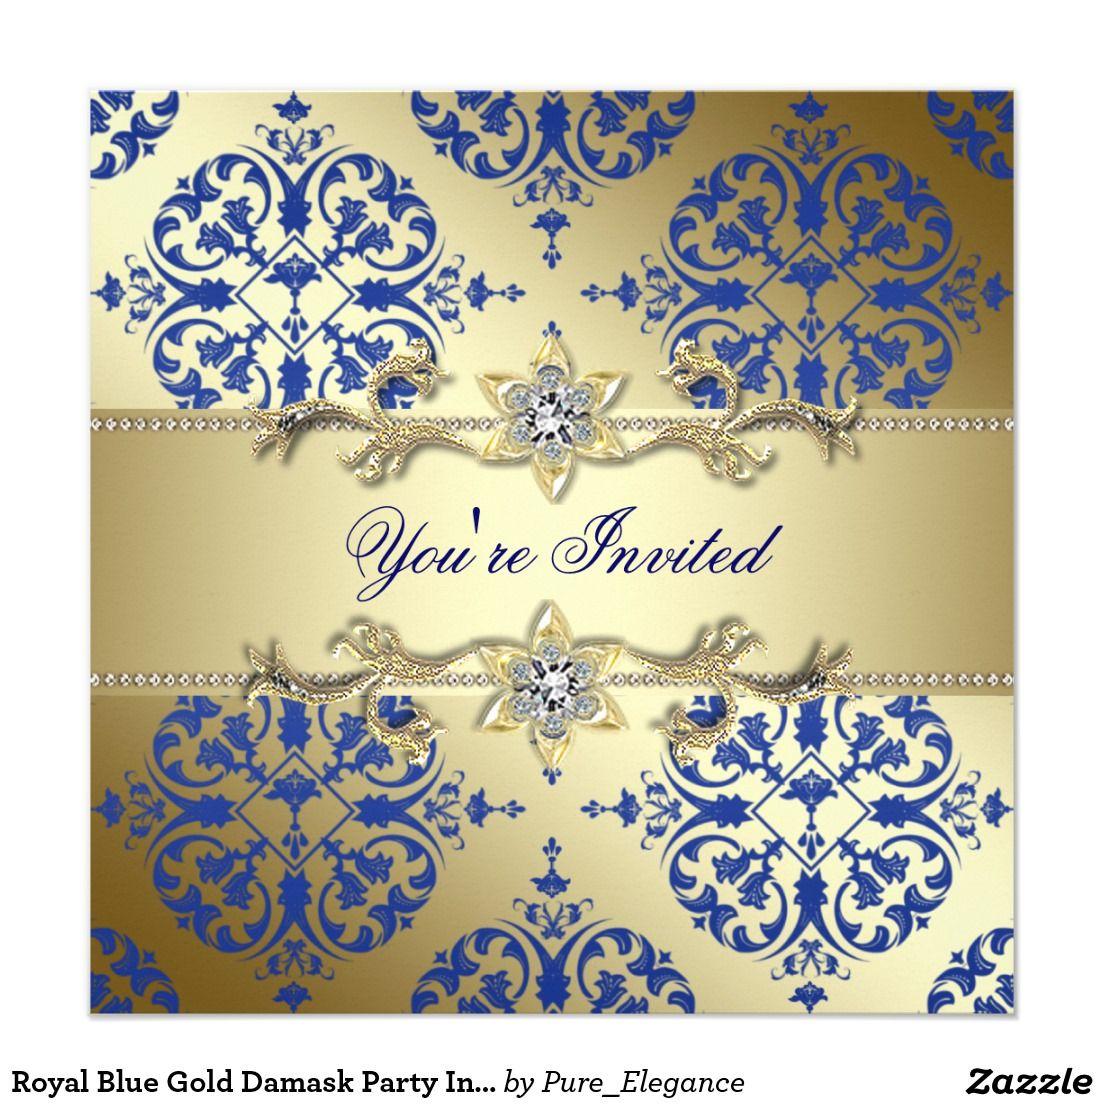 Royal Blue Gold Damask Party Invitations | sweet 16 | Pinterest ...